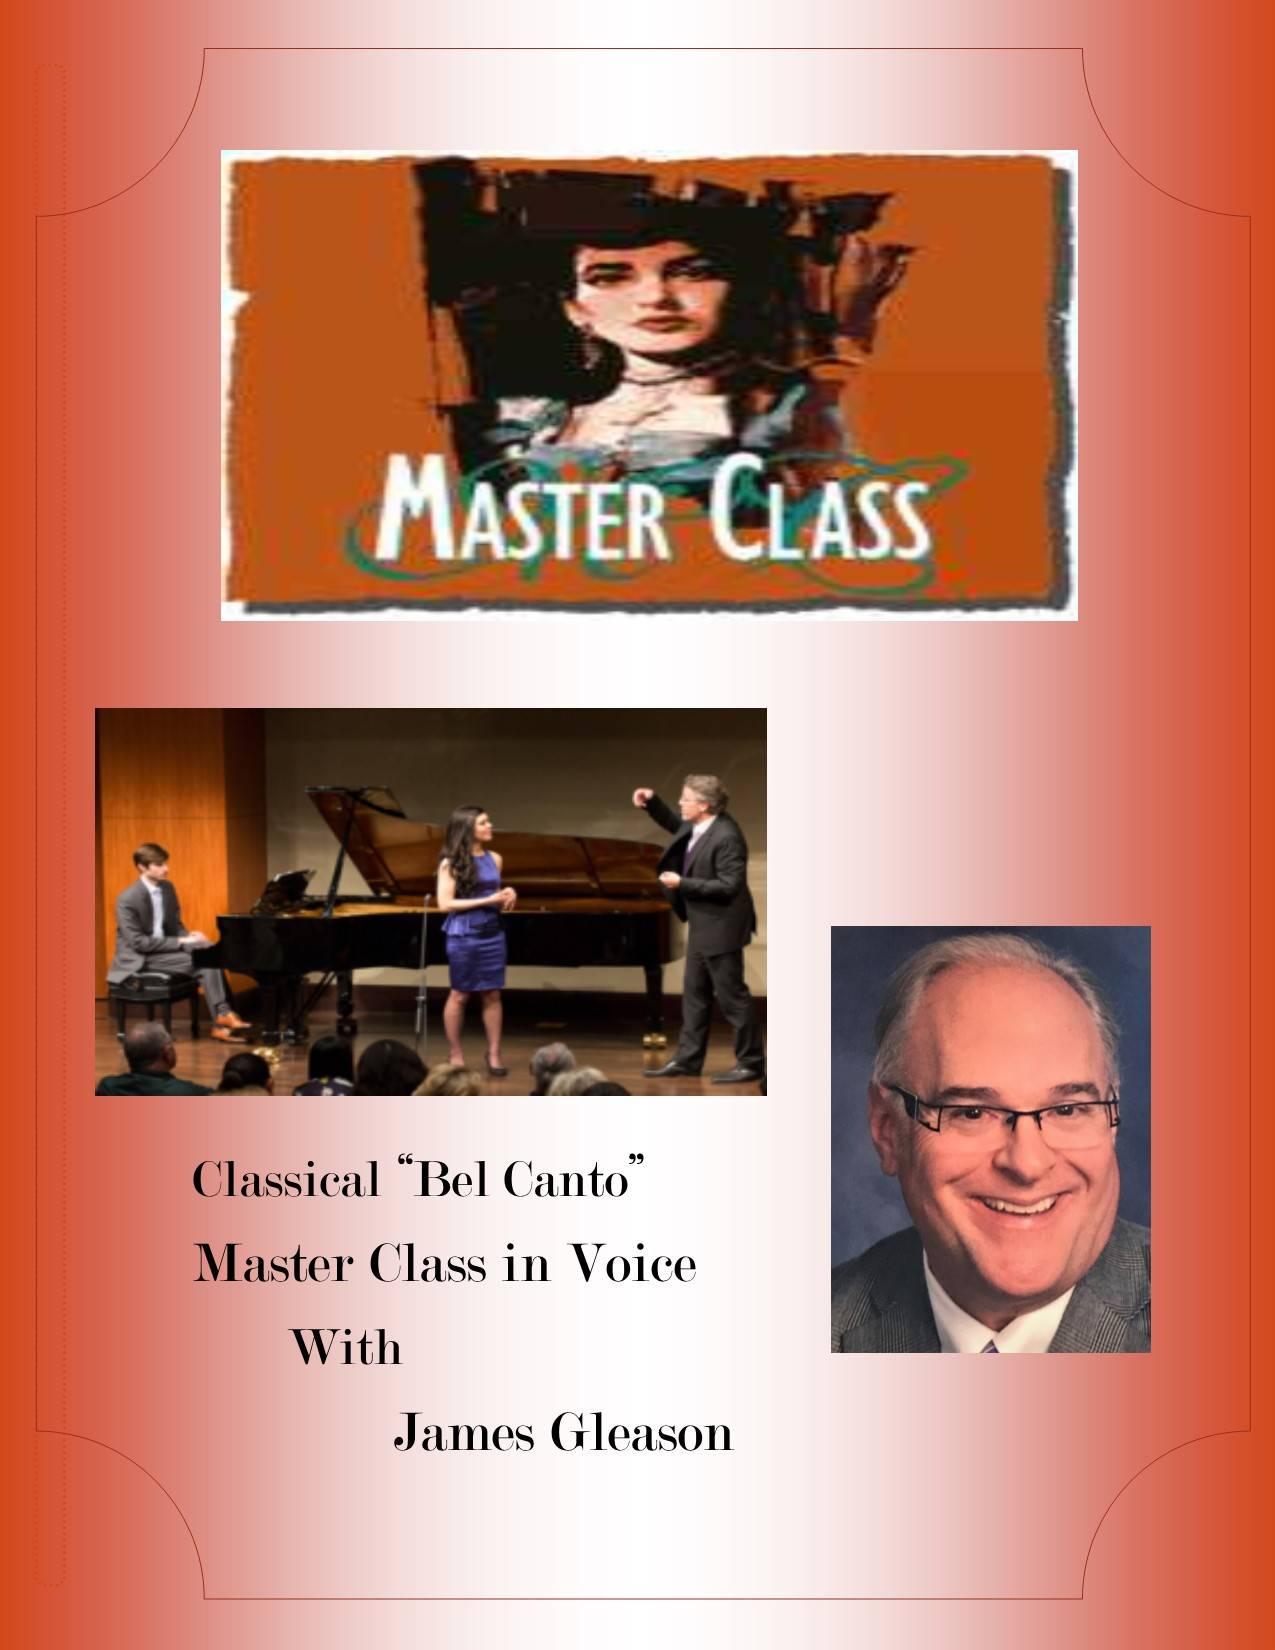 James Gleason Poster